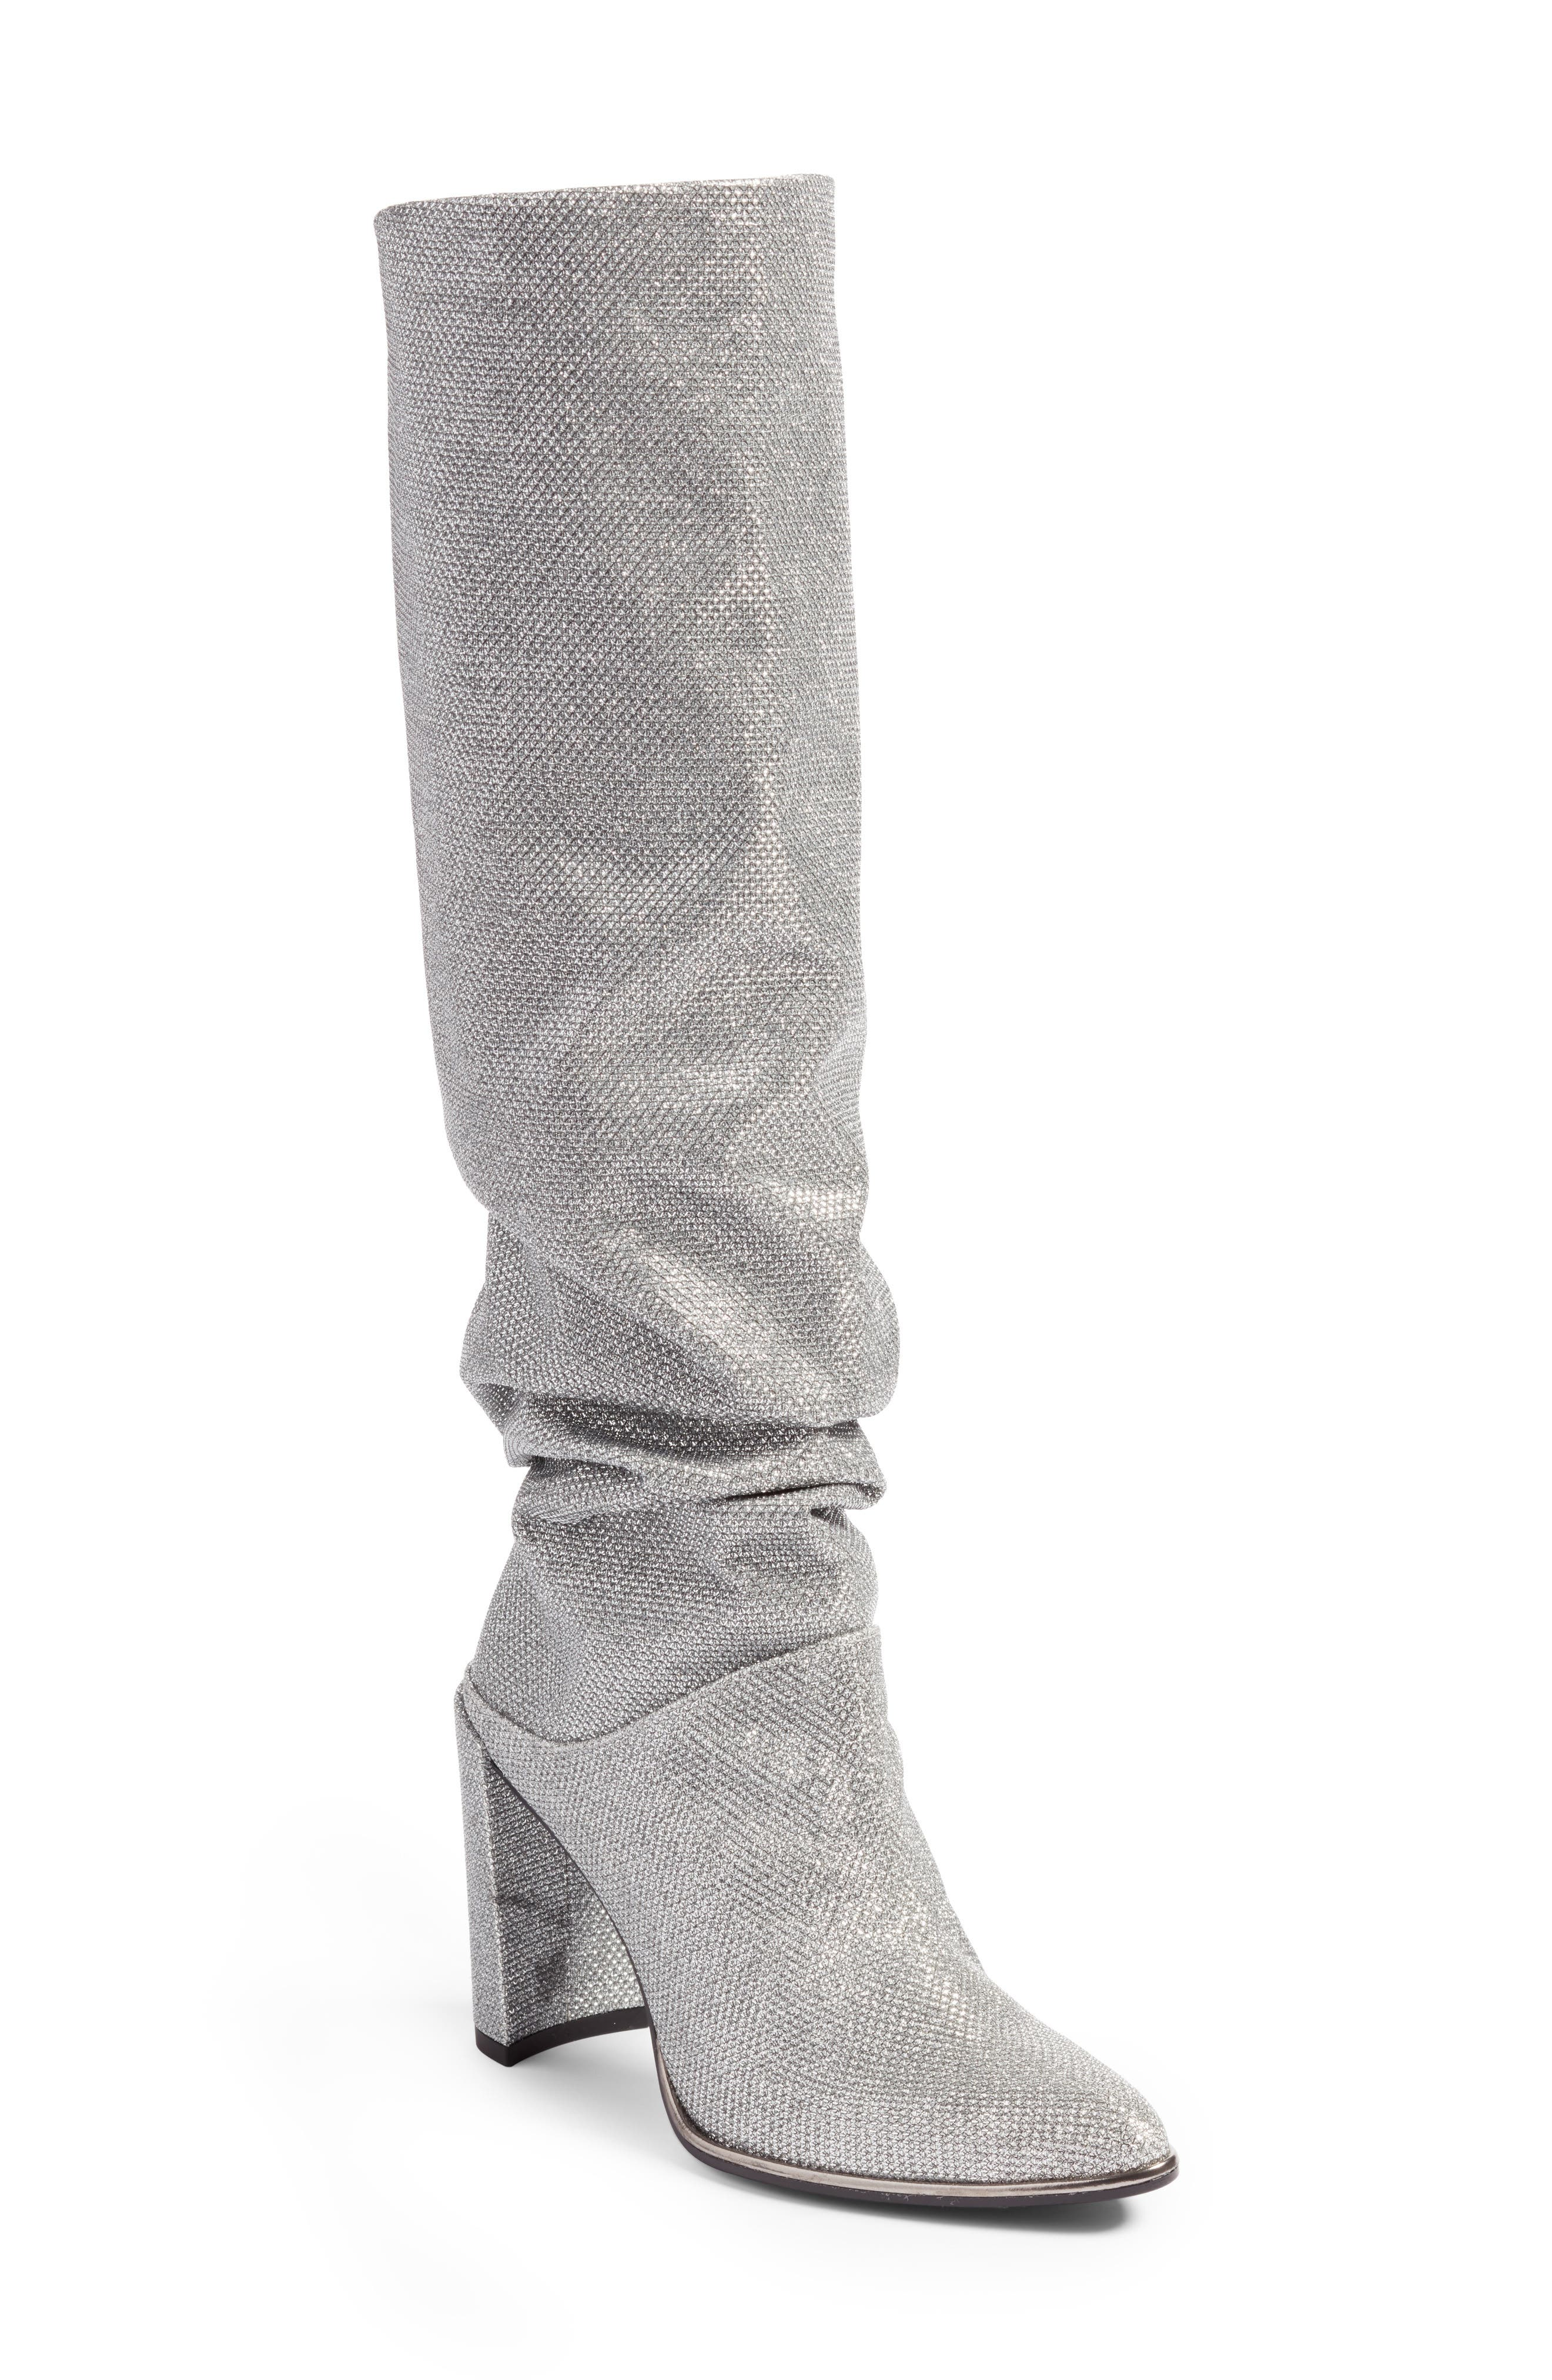 Main Image - Stuart Weitzman Smashing Knee High Boot (Women)